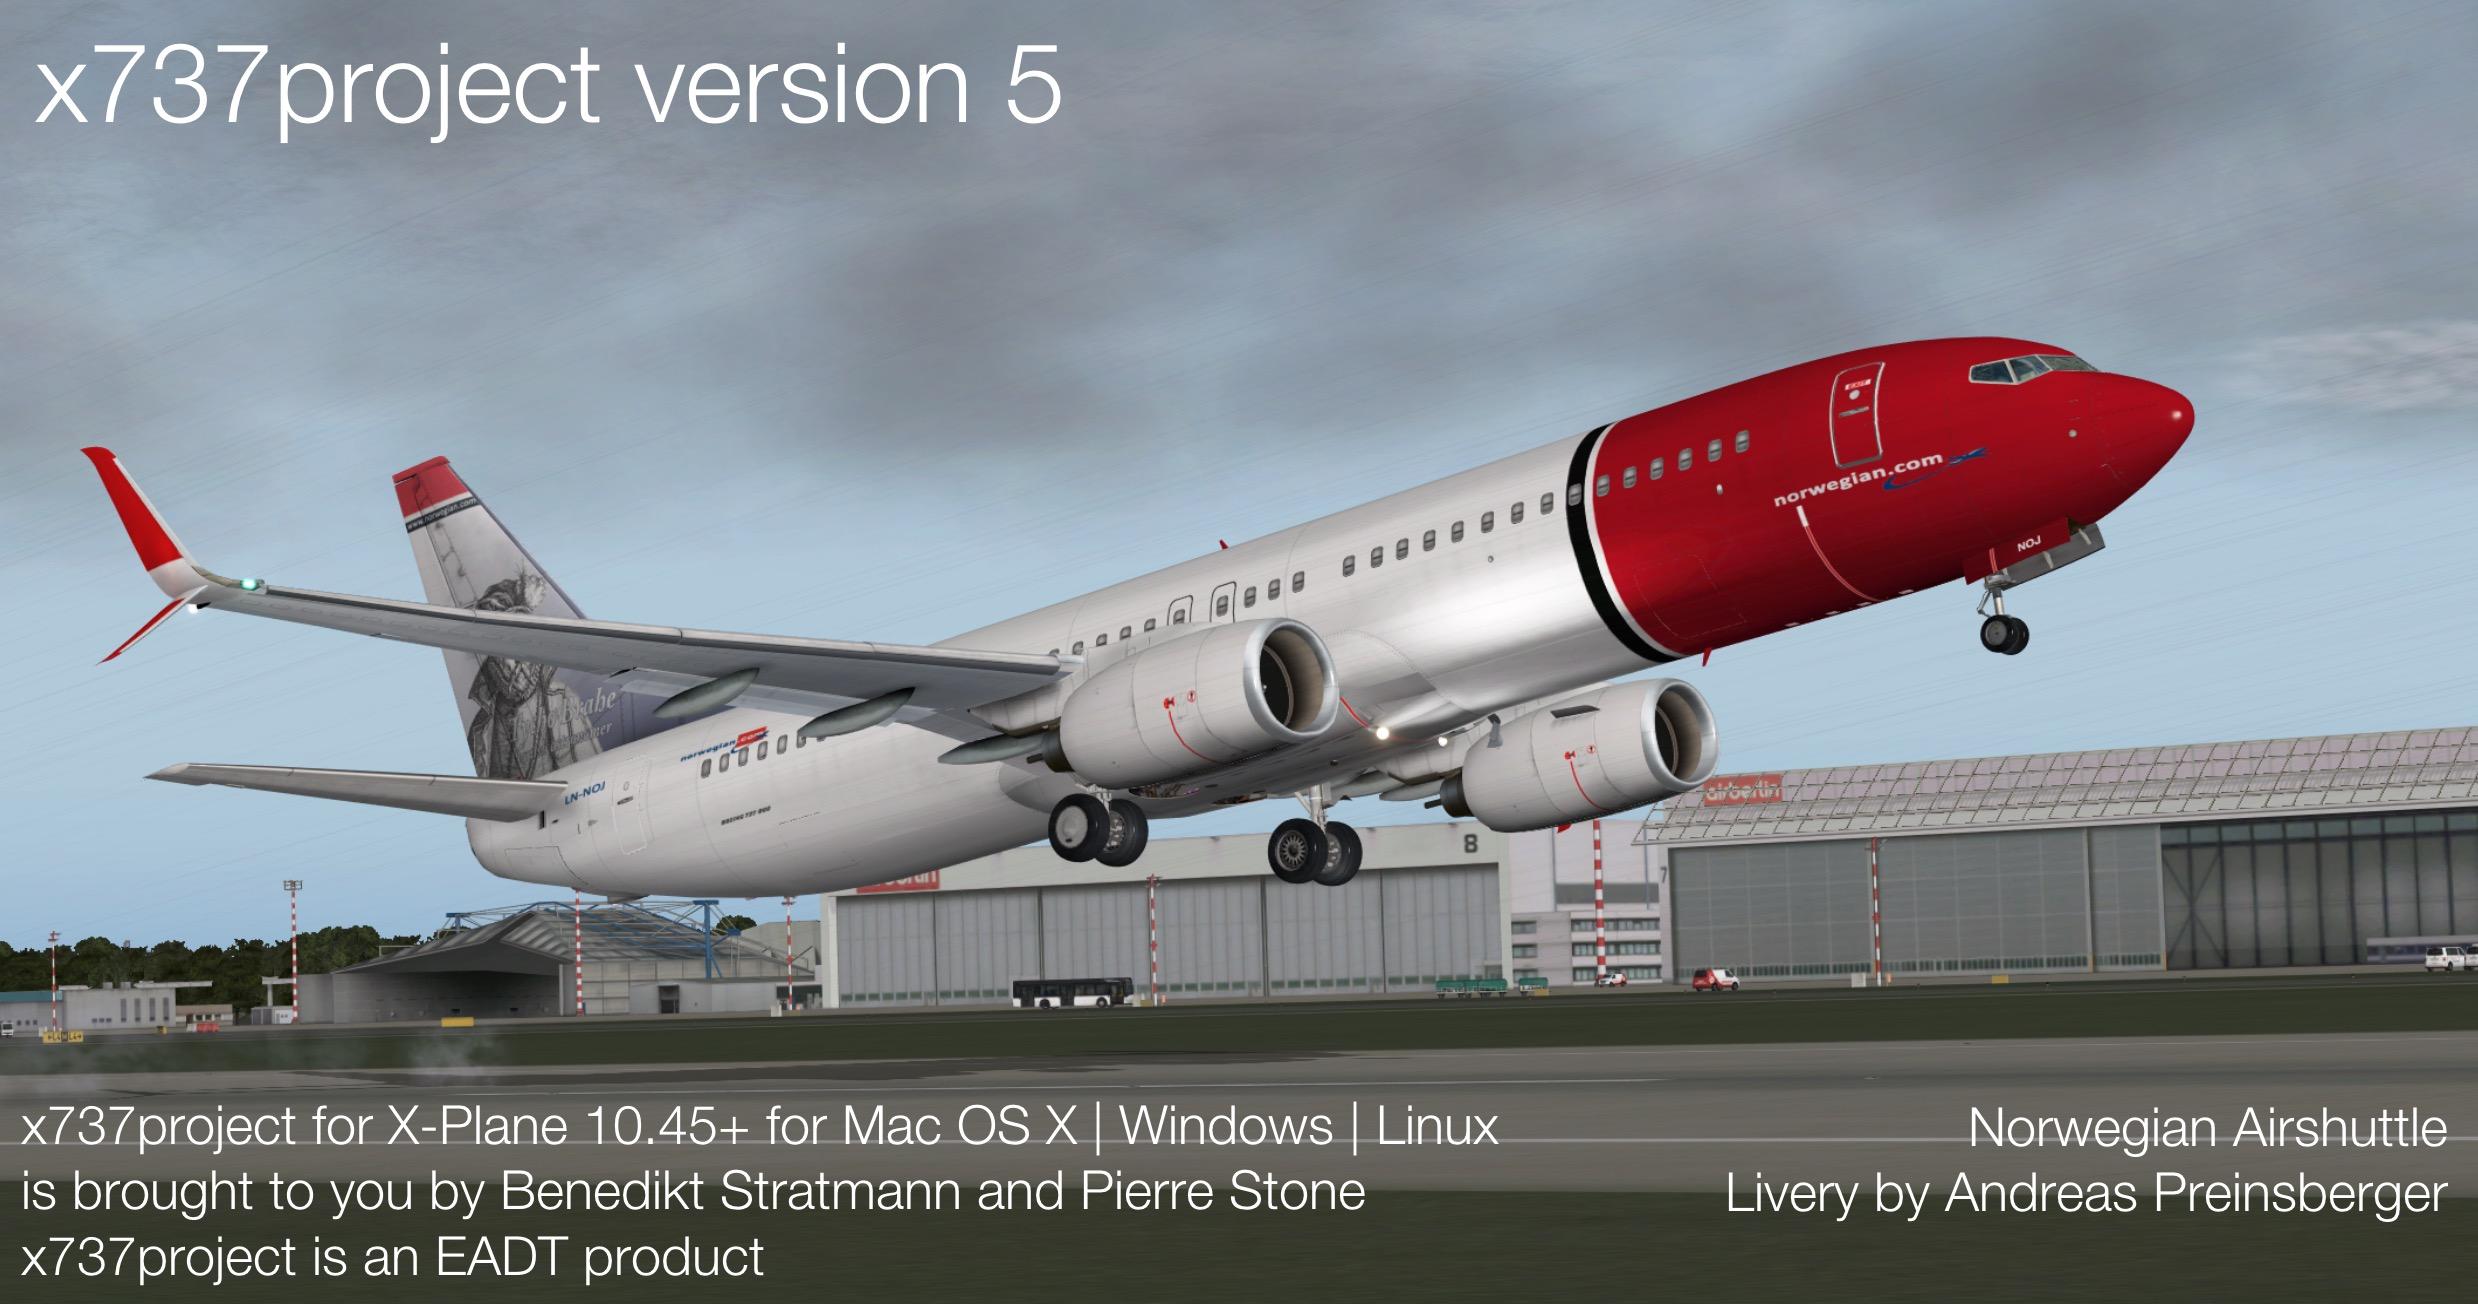 x737project анонсировали версию 5 - Самолеты для X-Plane 10 - AVSIM